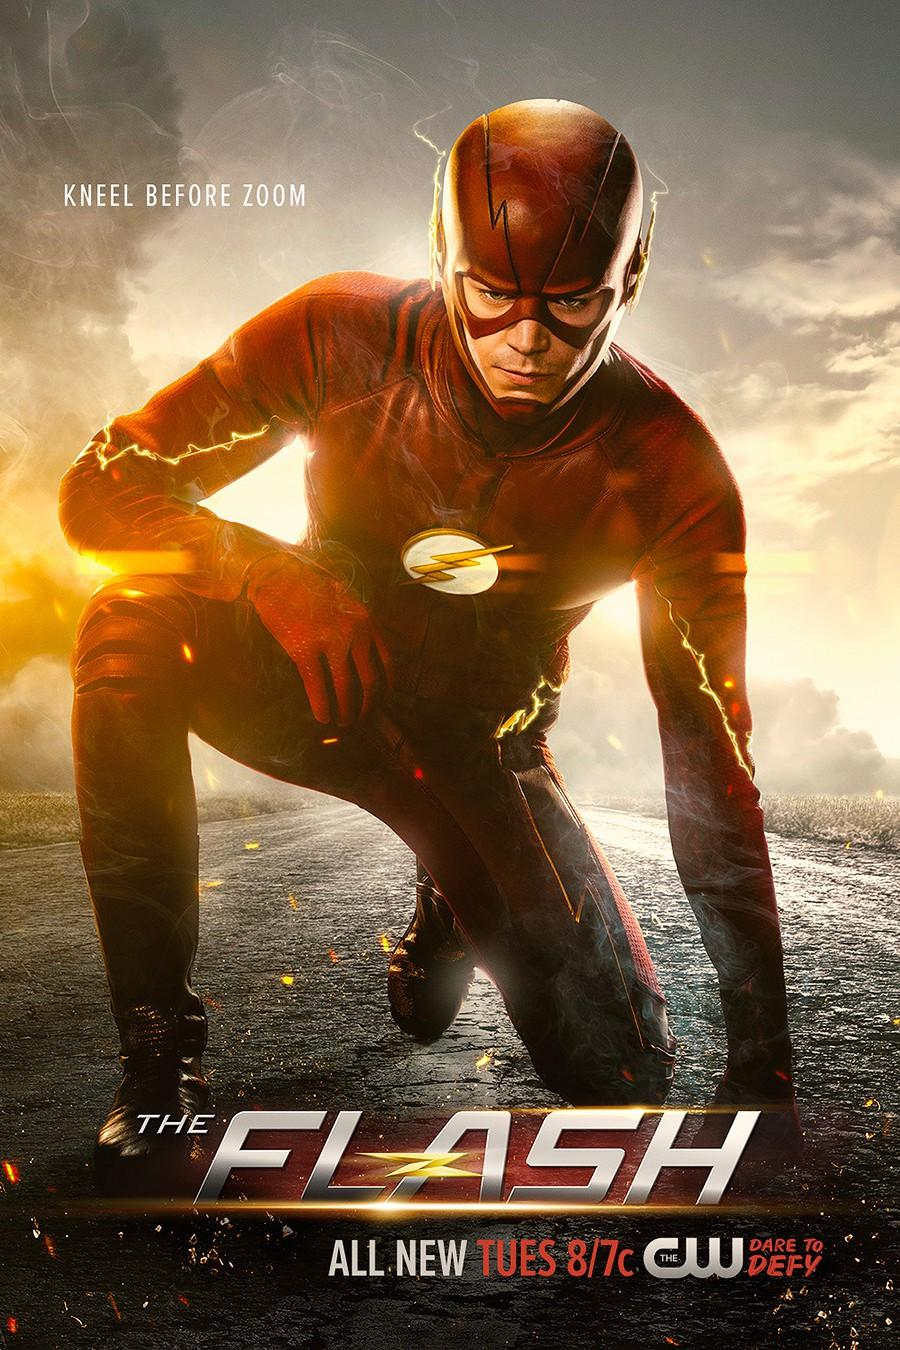 The%20Flash.10 1 دانلود سریال The Flash : قسمت آخر فصل ۴ اضافه شد